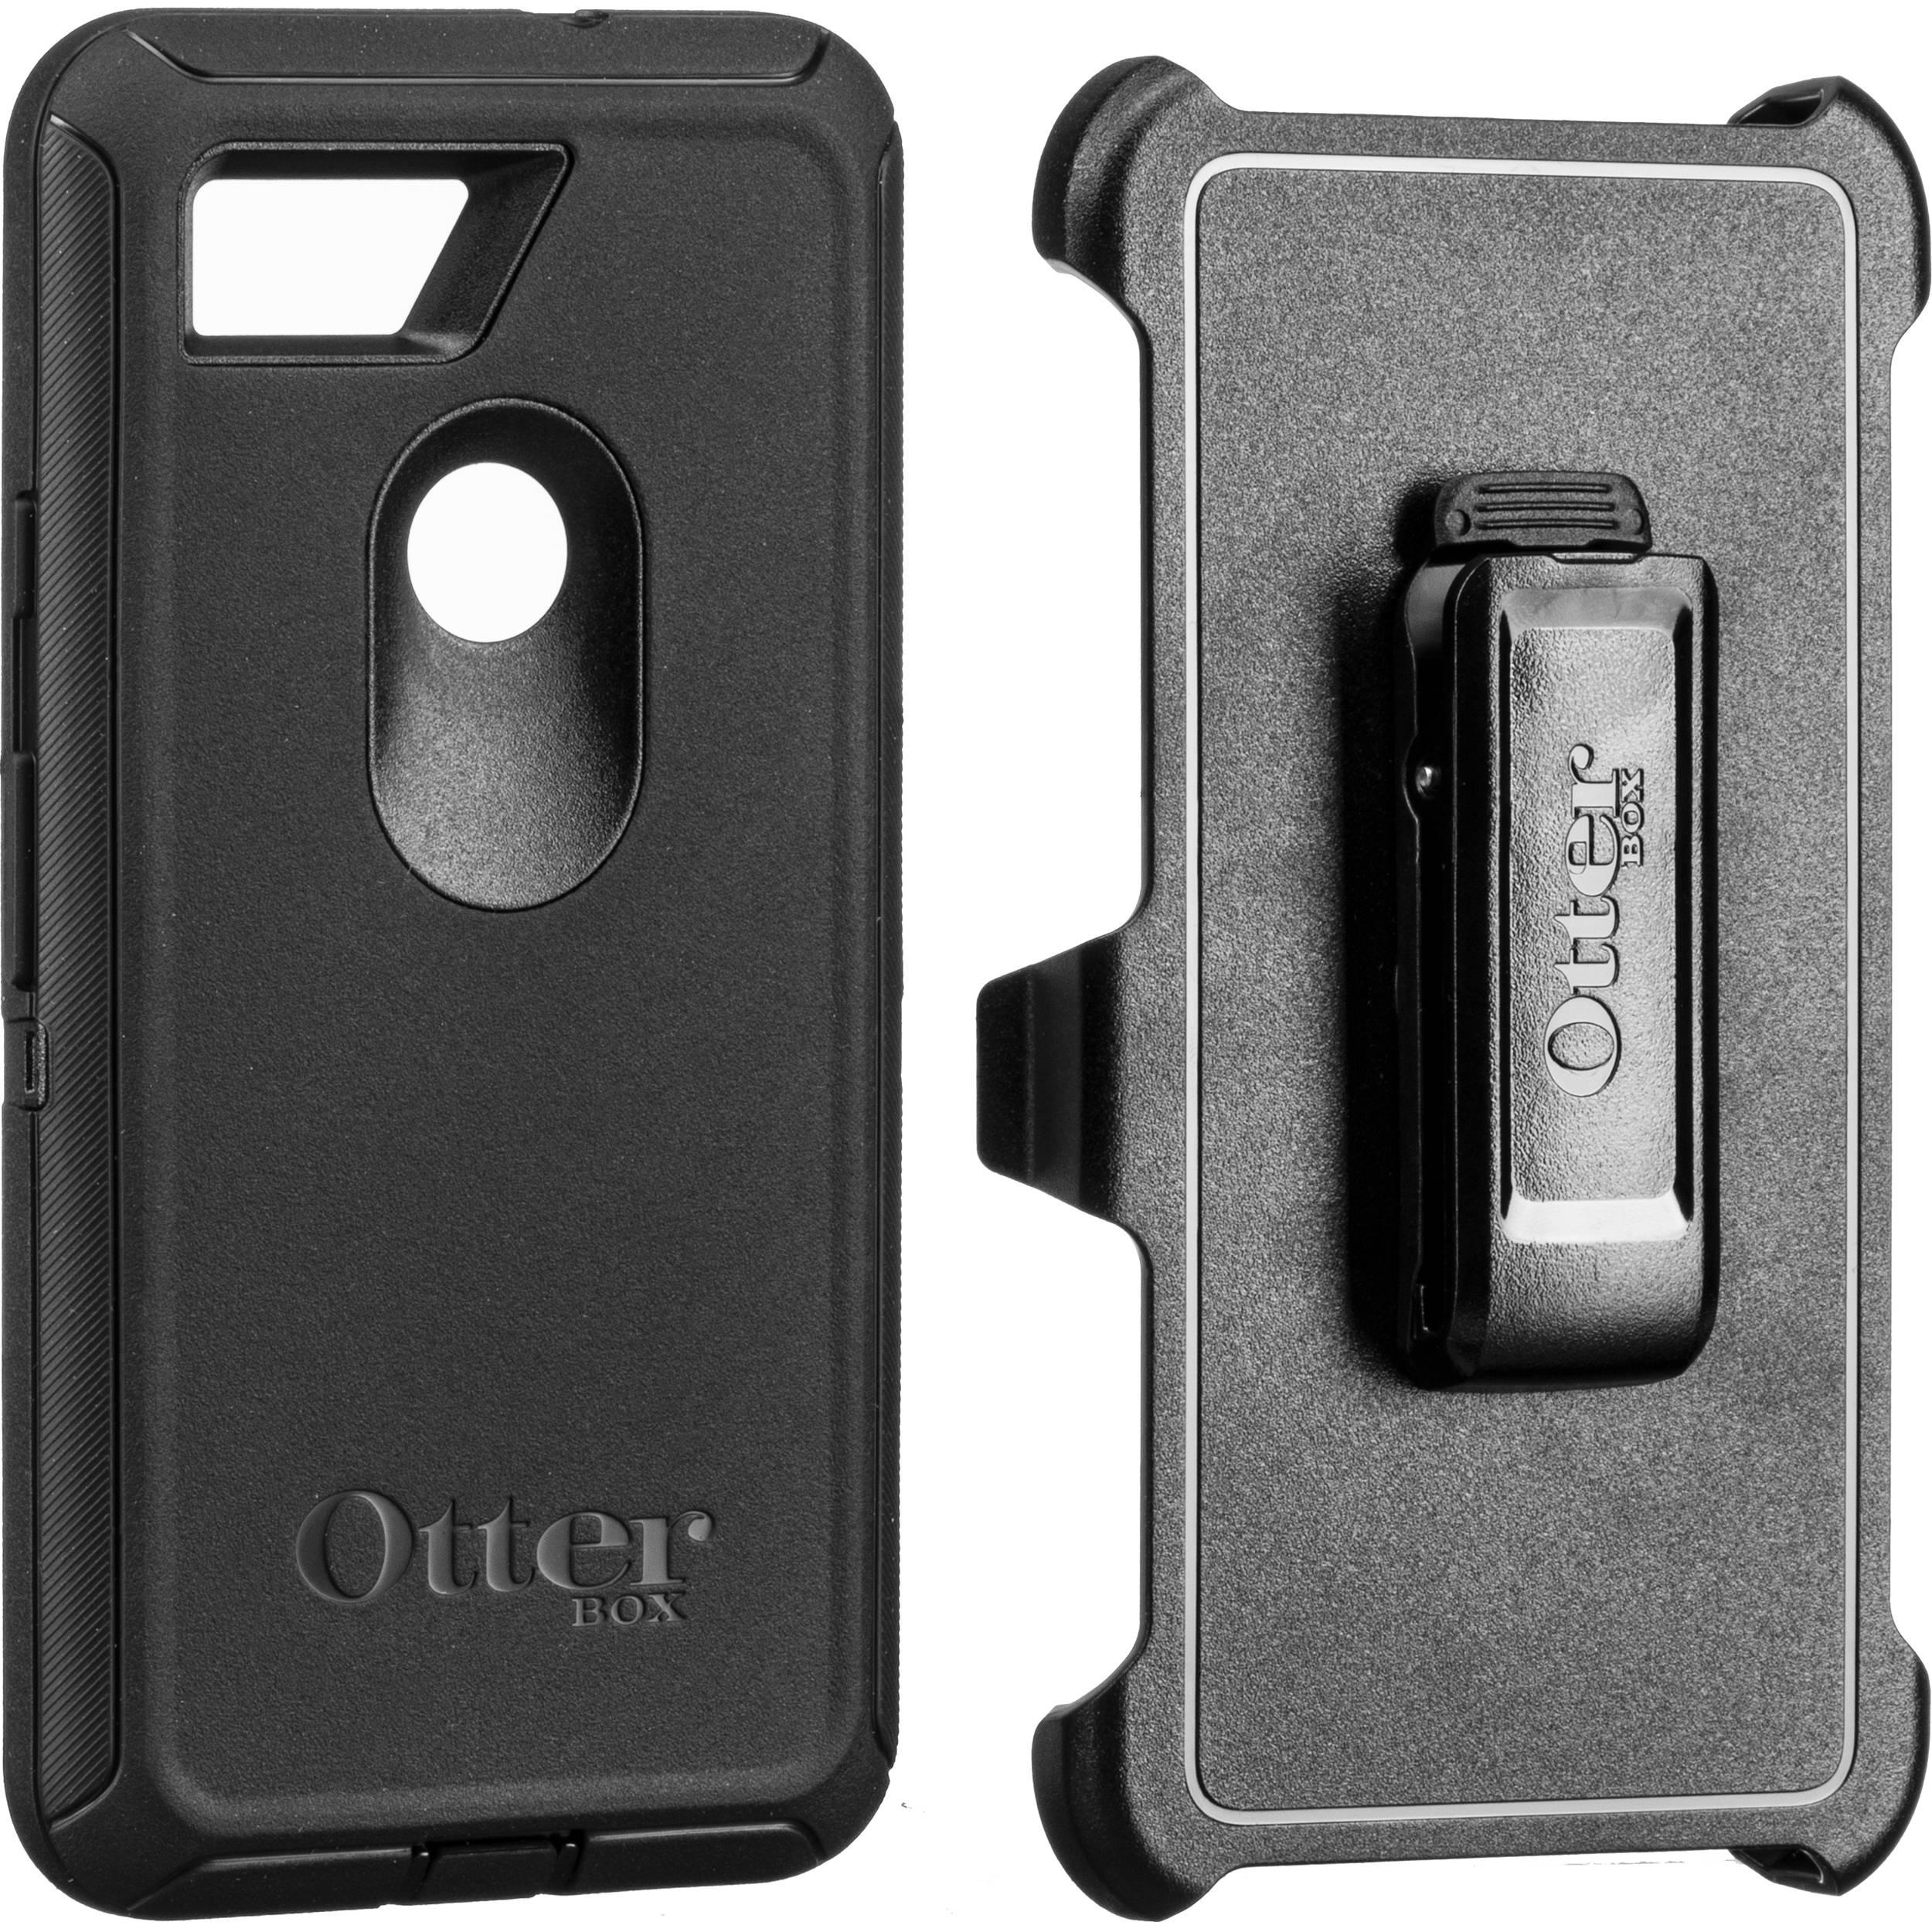 buy popular 9f54d 6d269 OtterBox Defender Series Screenless Edition Case for Google Pixel 2 XL  (Black)